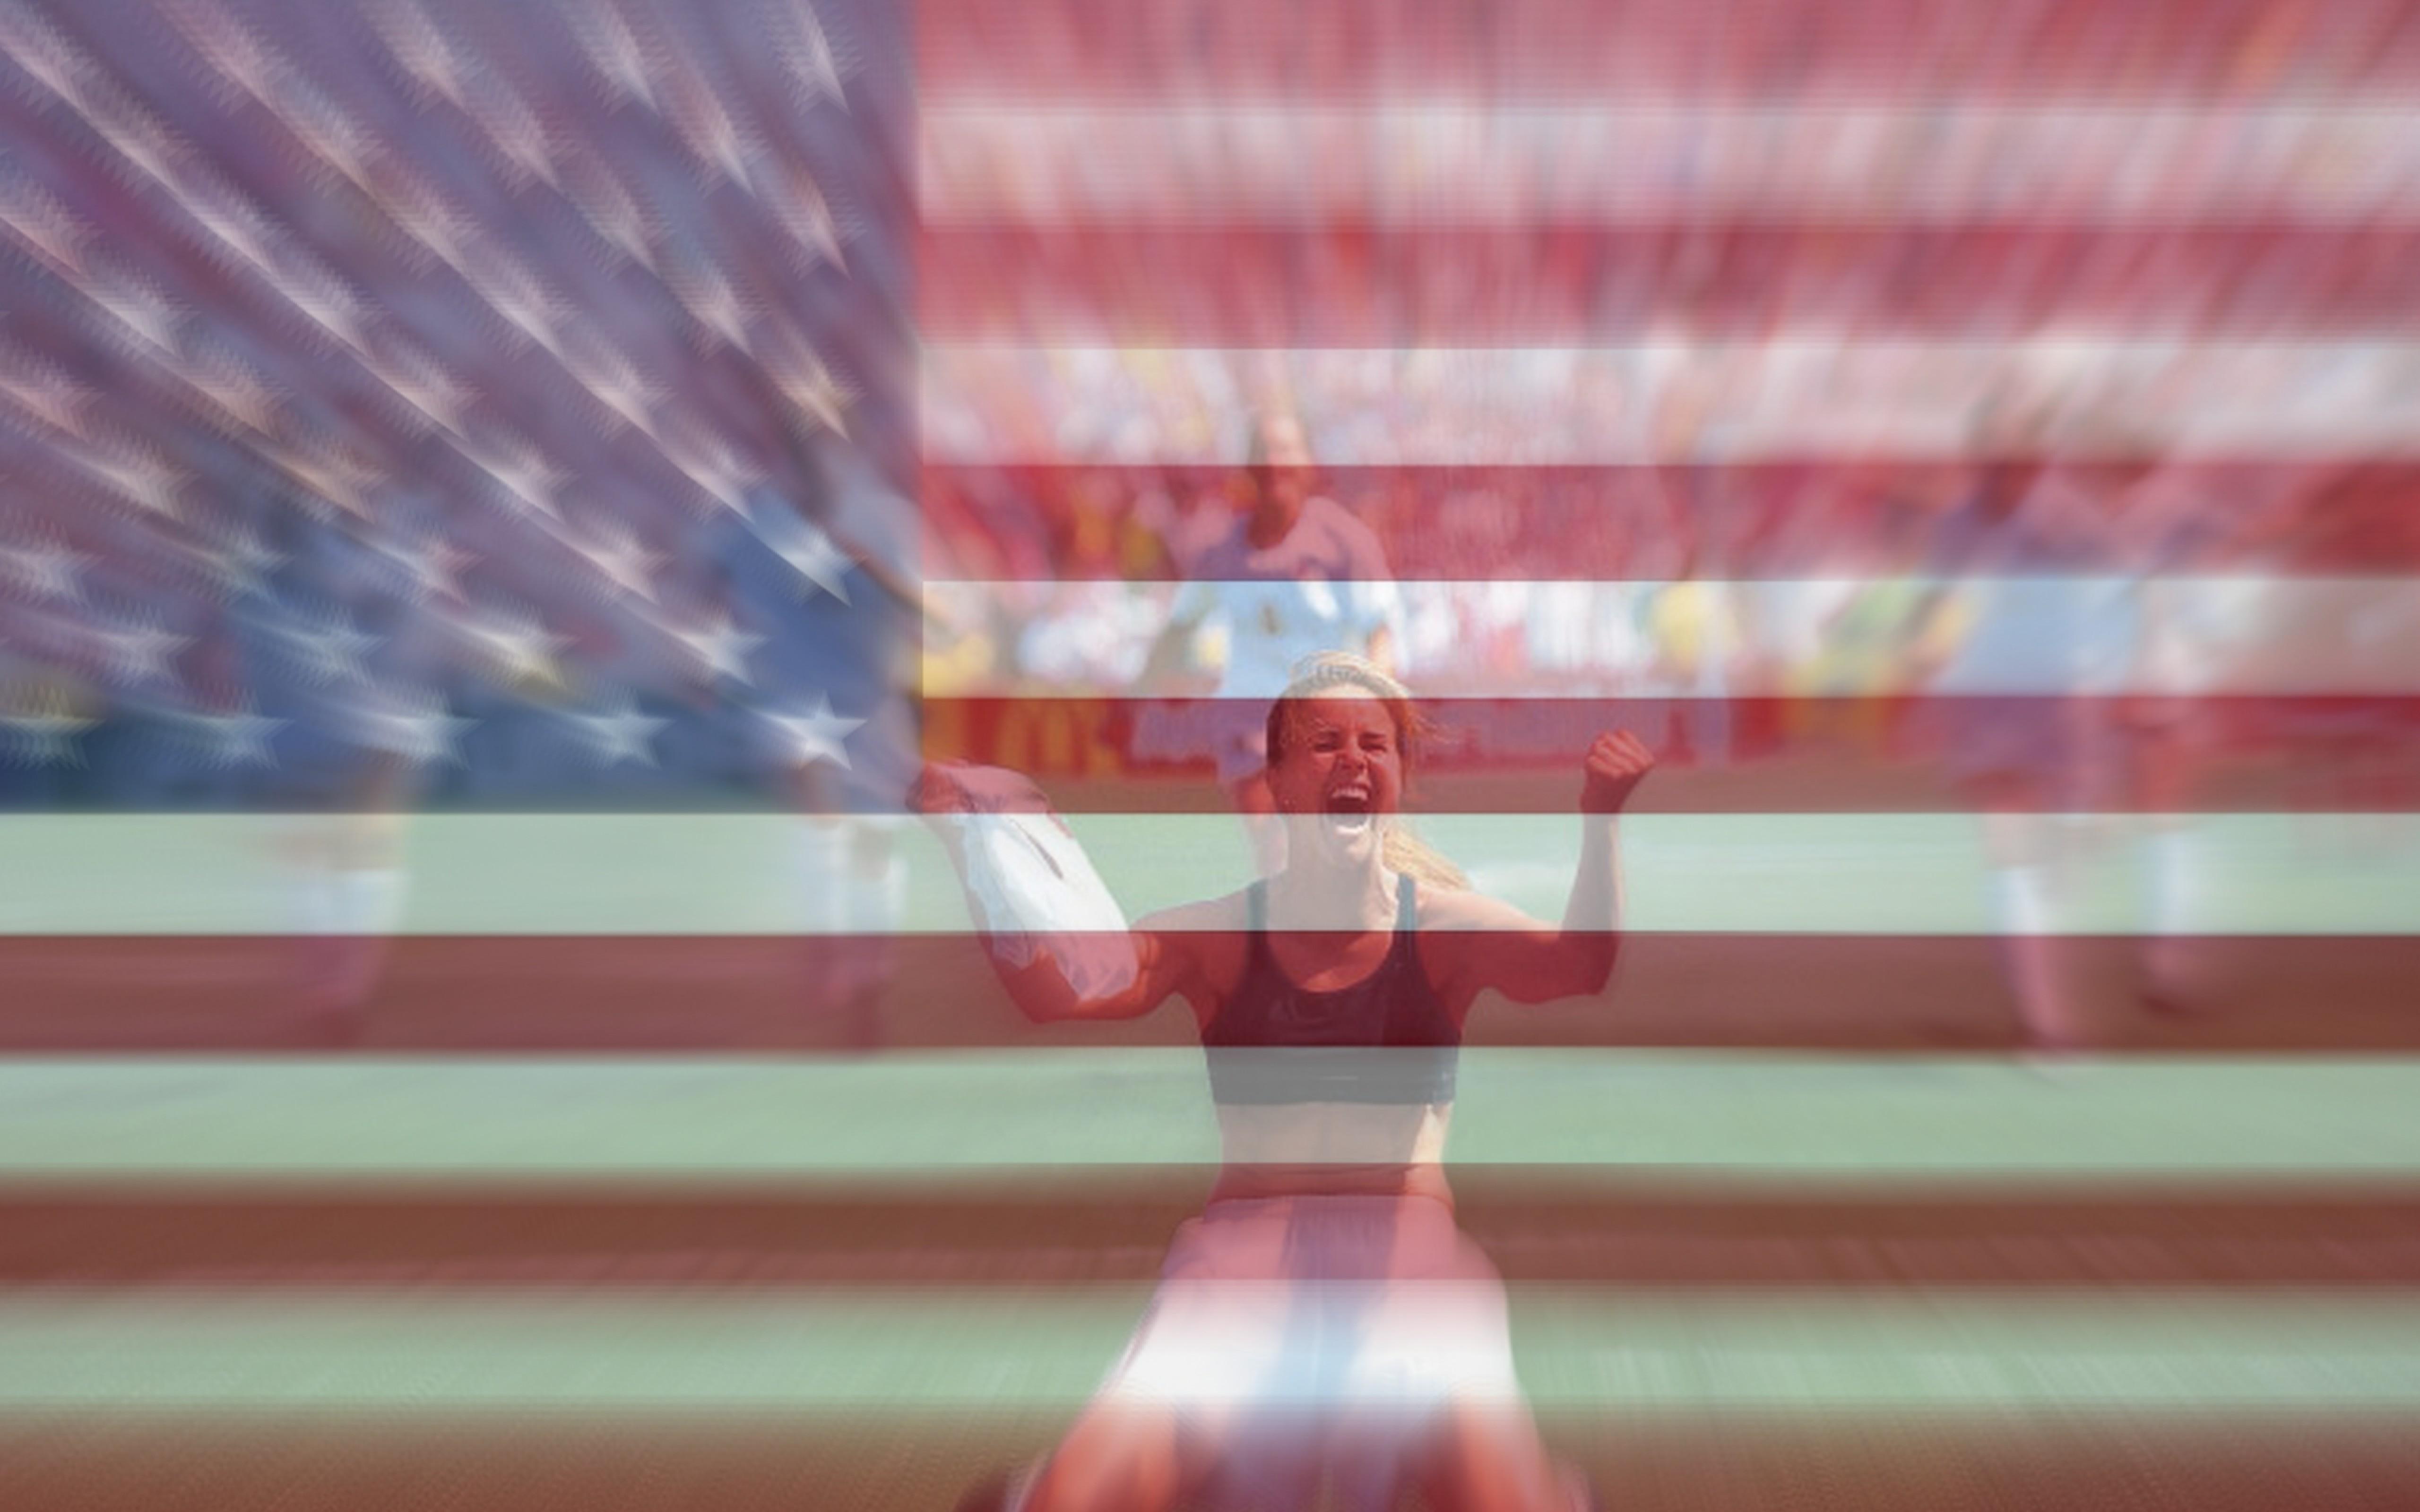 Jul-10-1999: Brandi Chastain's Shot Heard 'Round the World